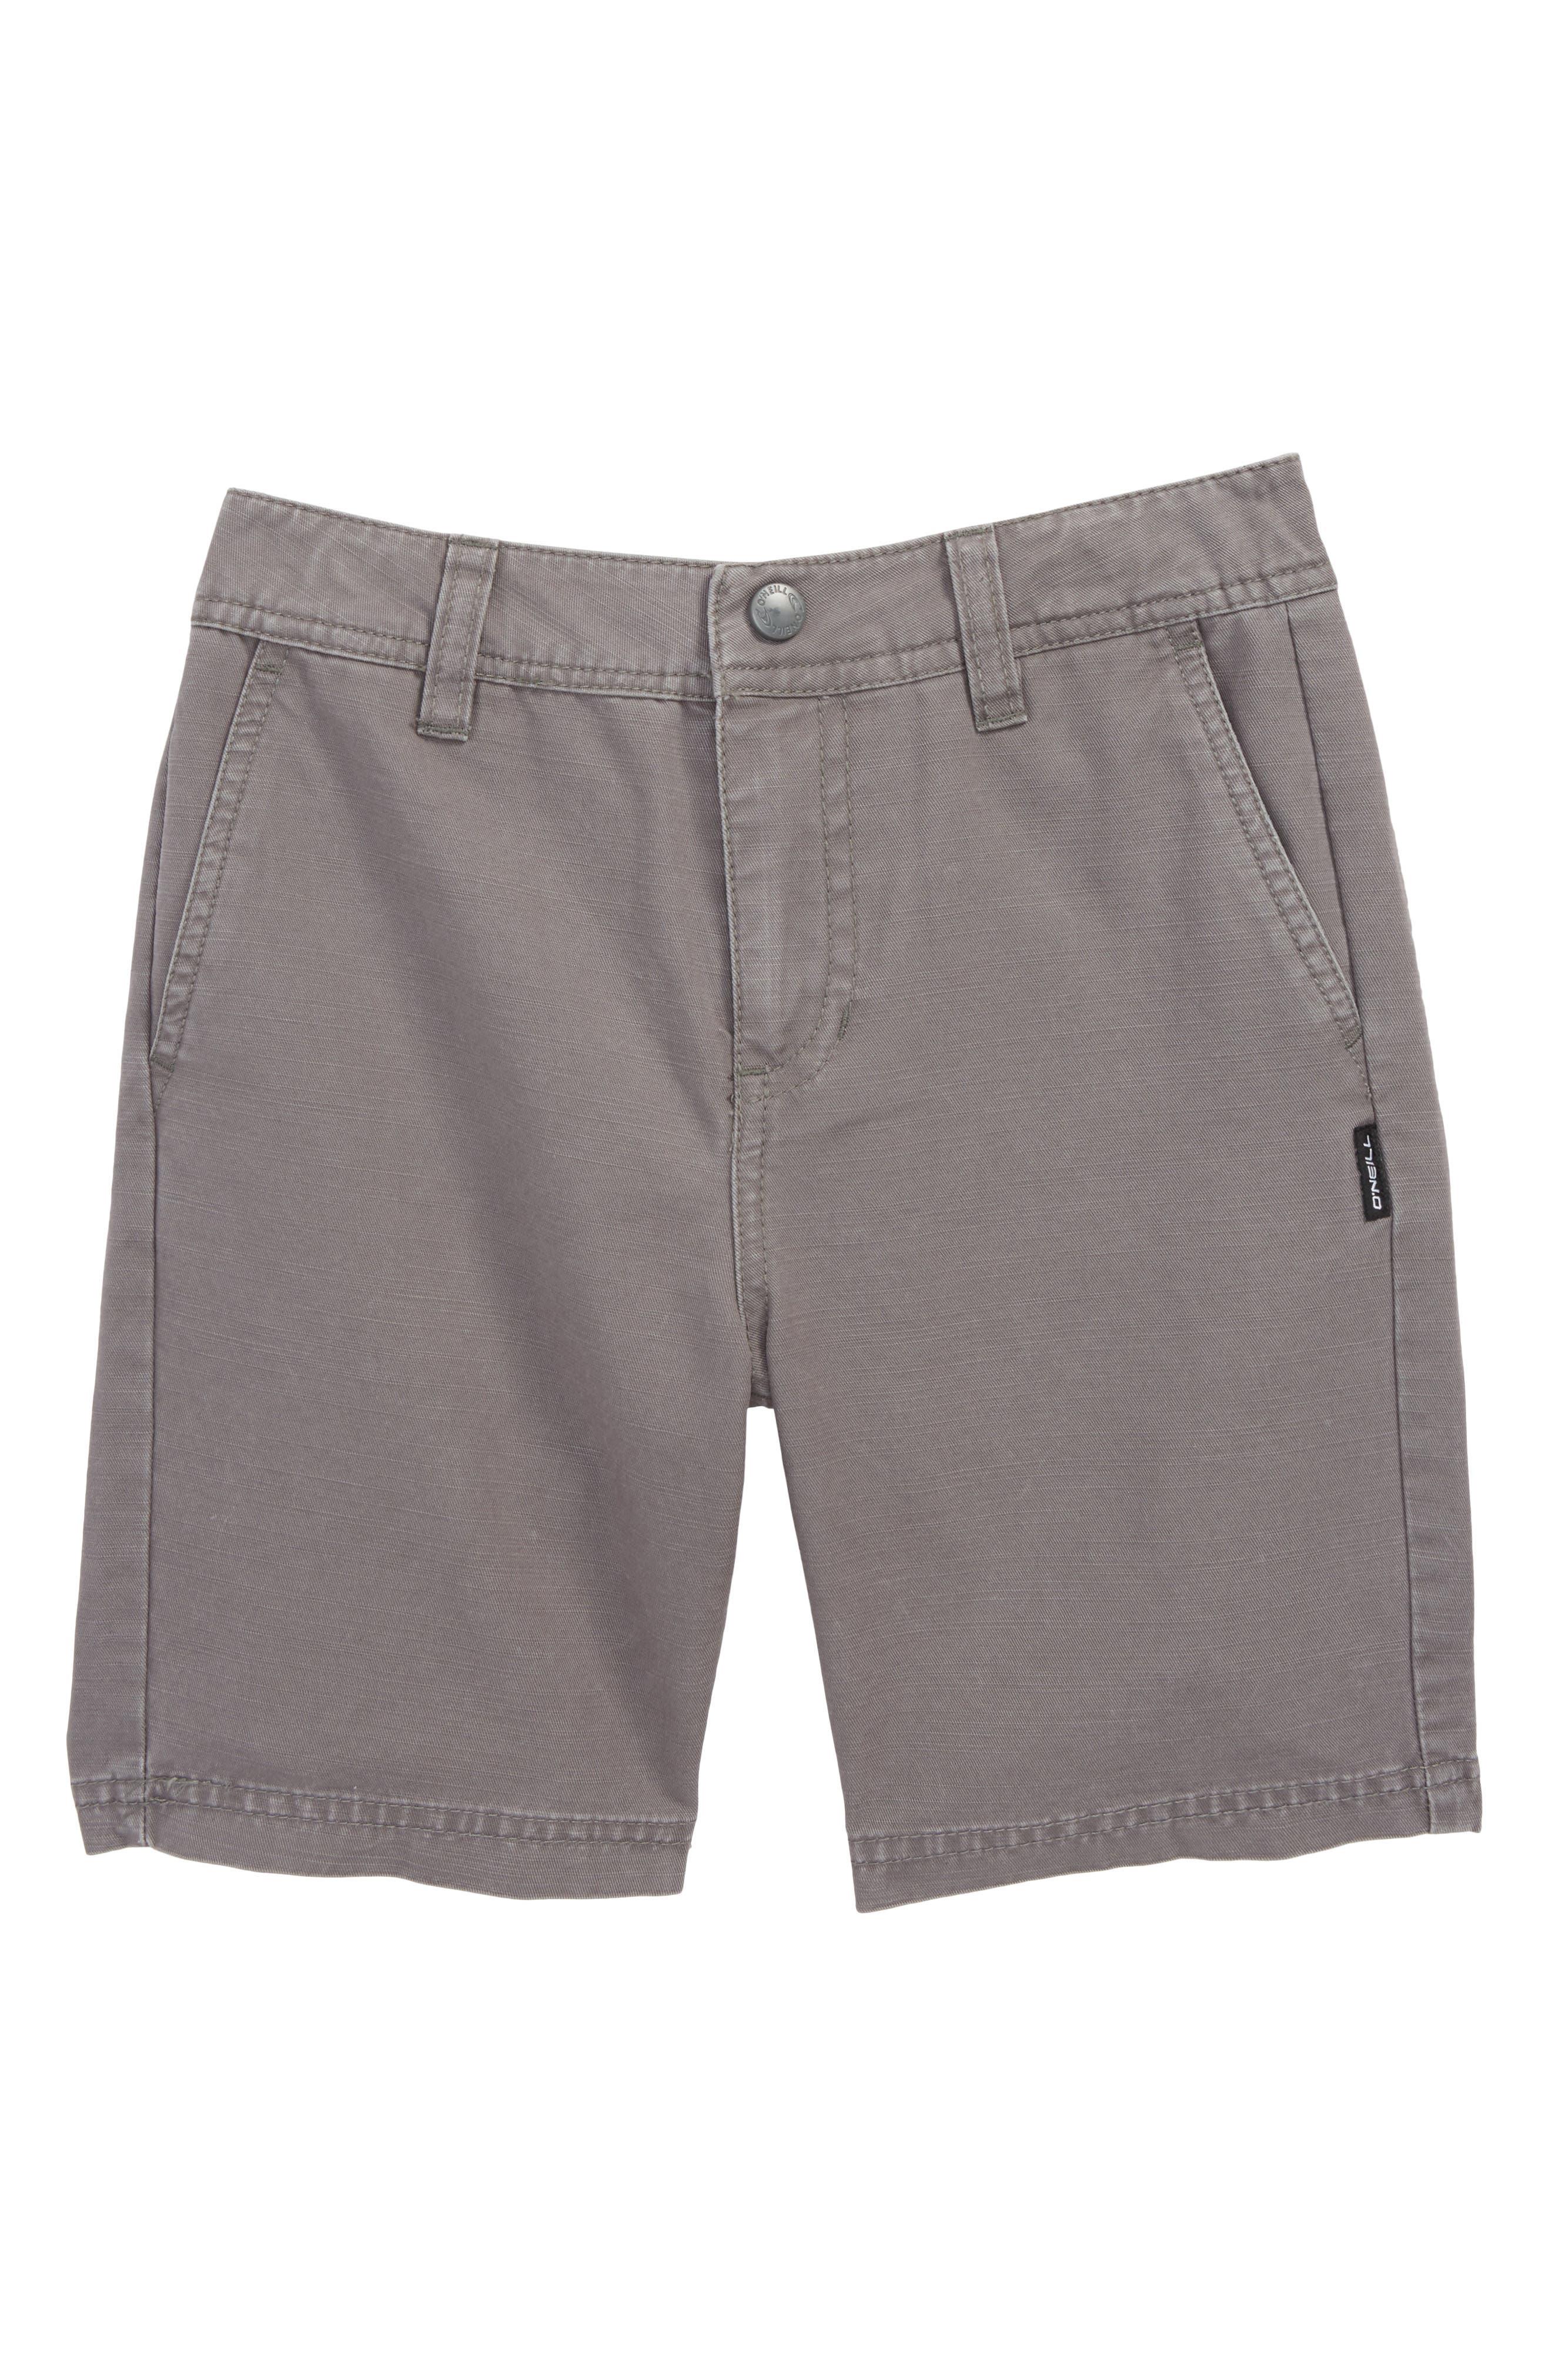 O'Neill Jay Chino Shorts (Little Boys & Big Boys)